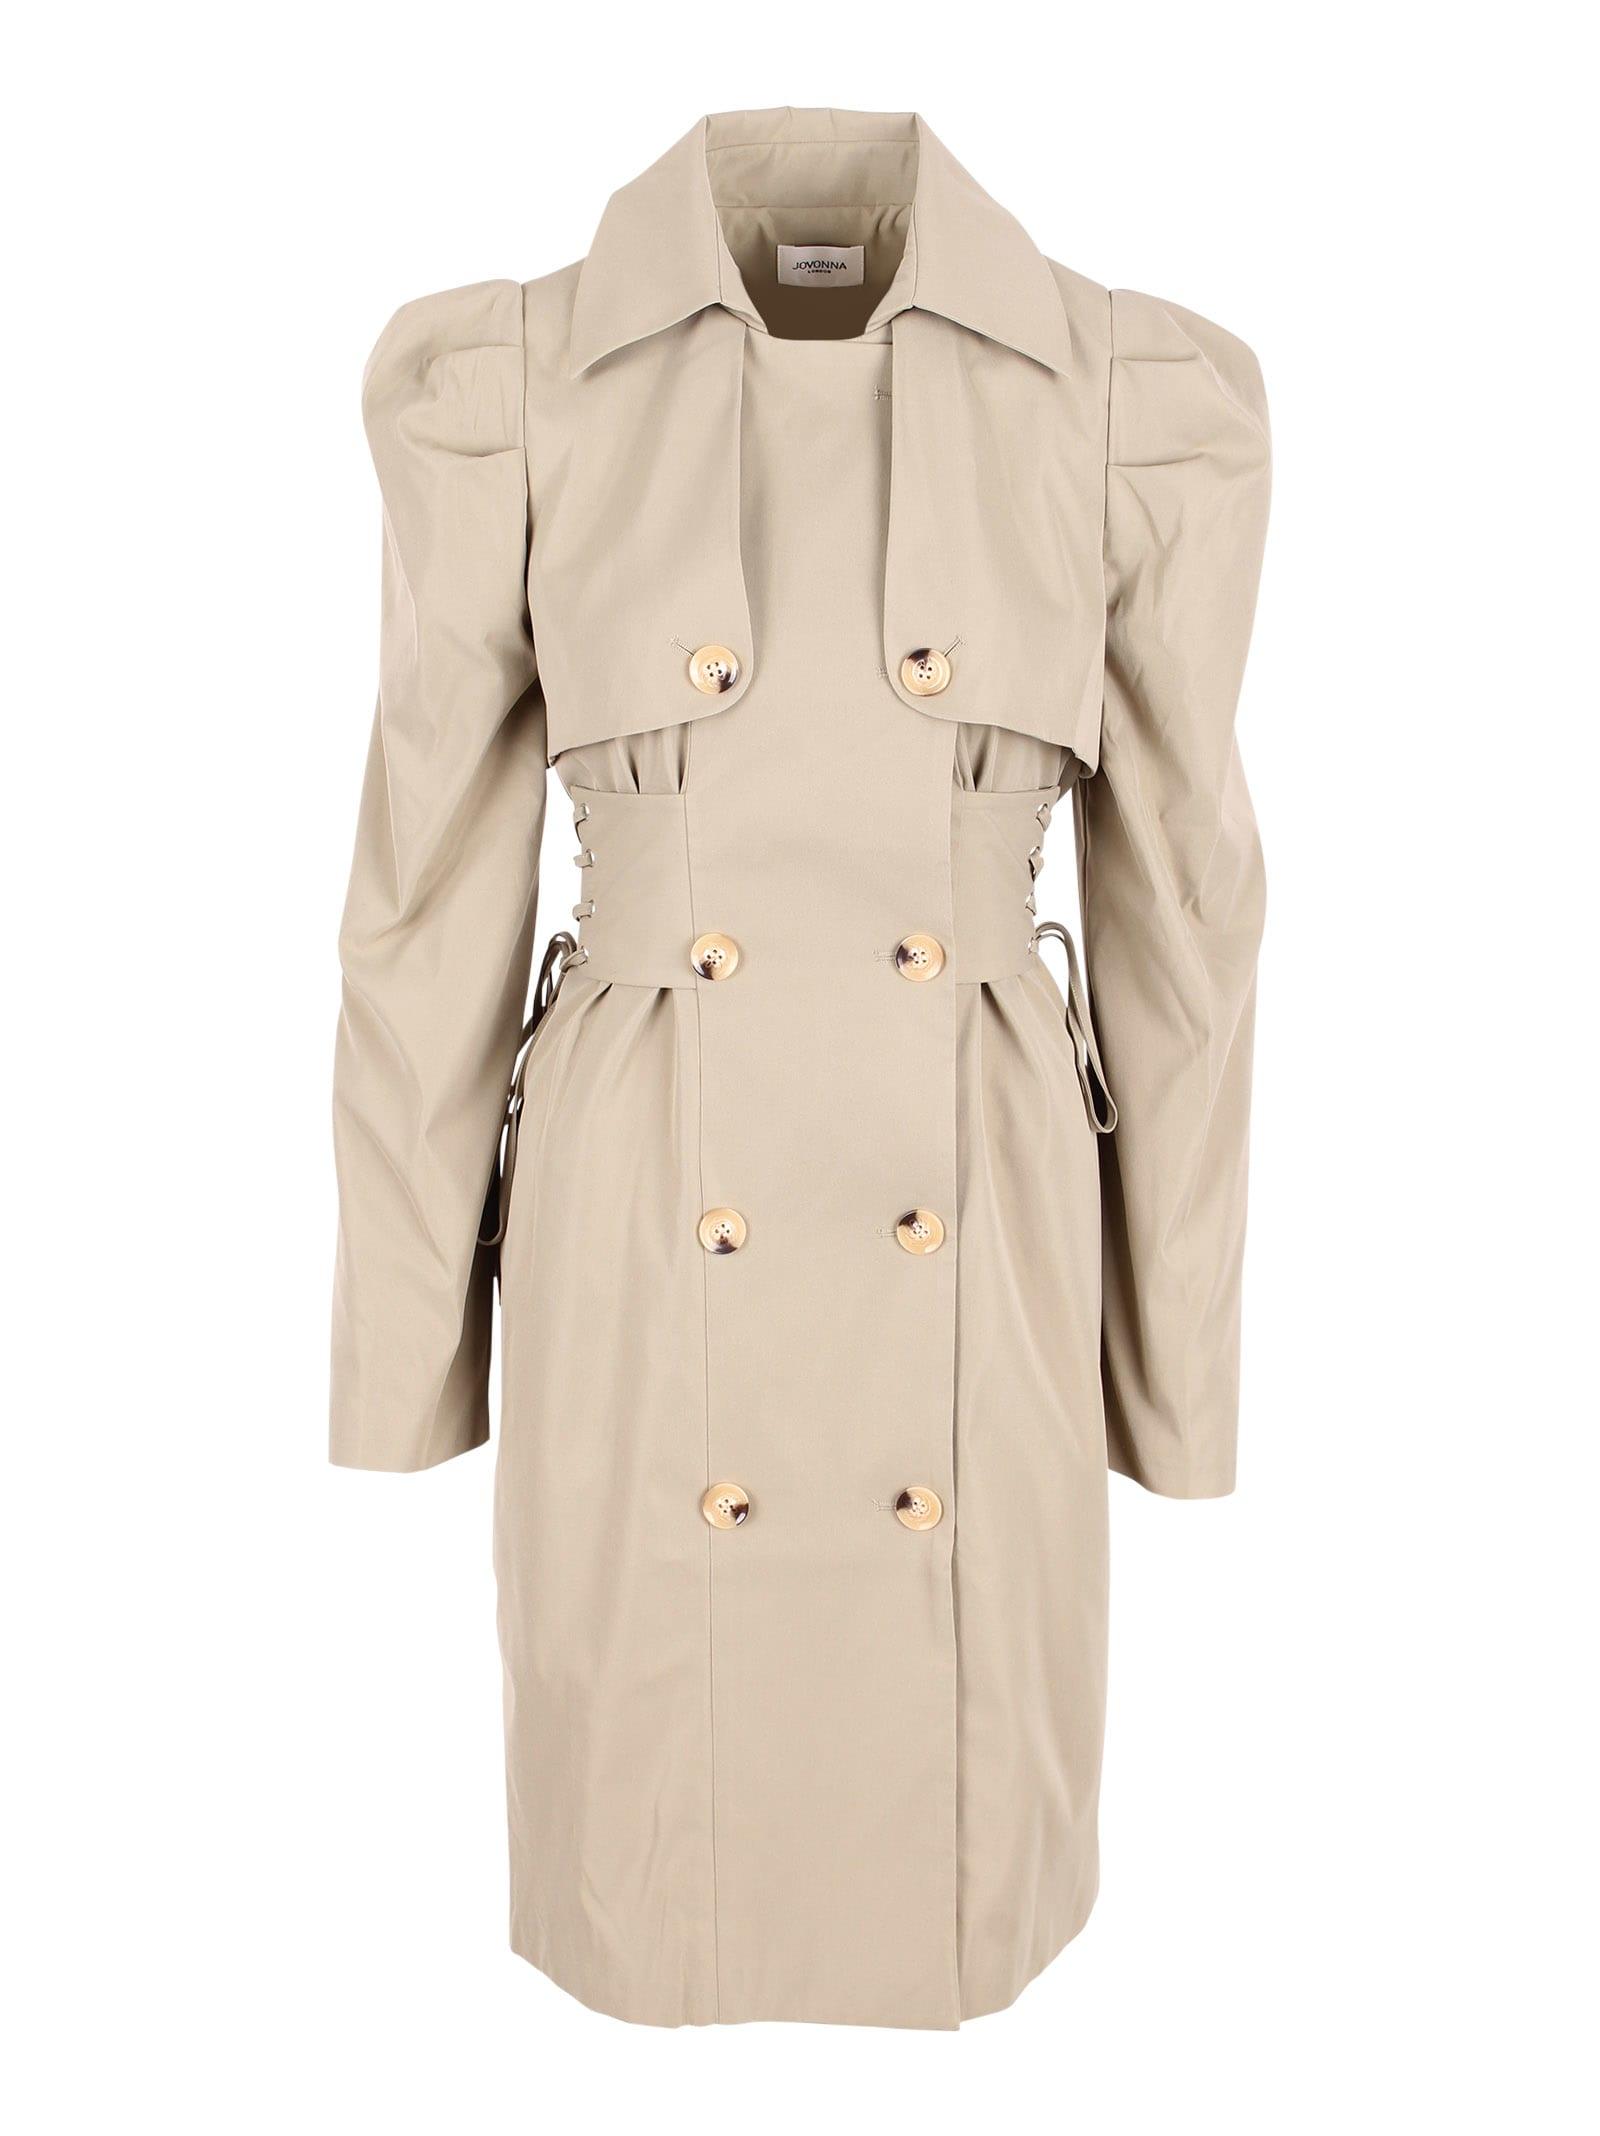 London wiltshire Polyester Raincoat